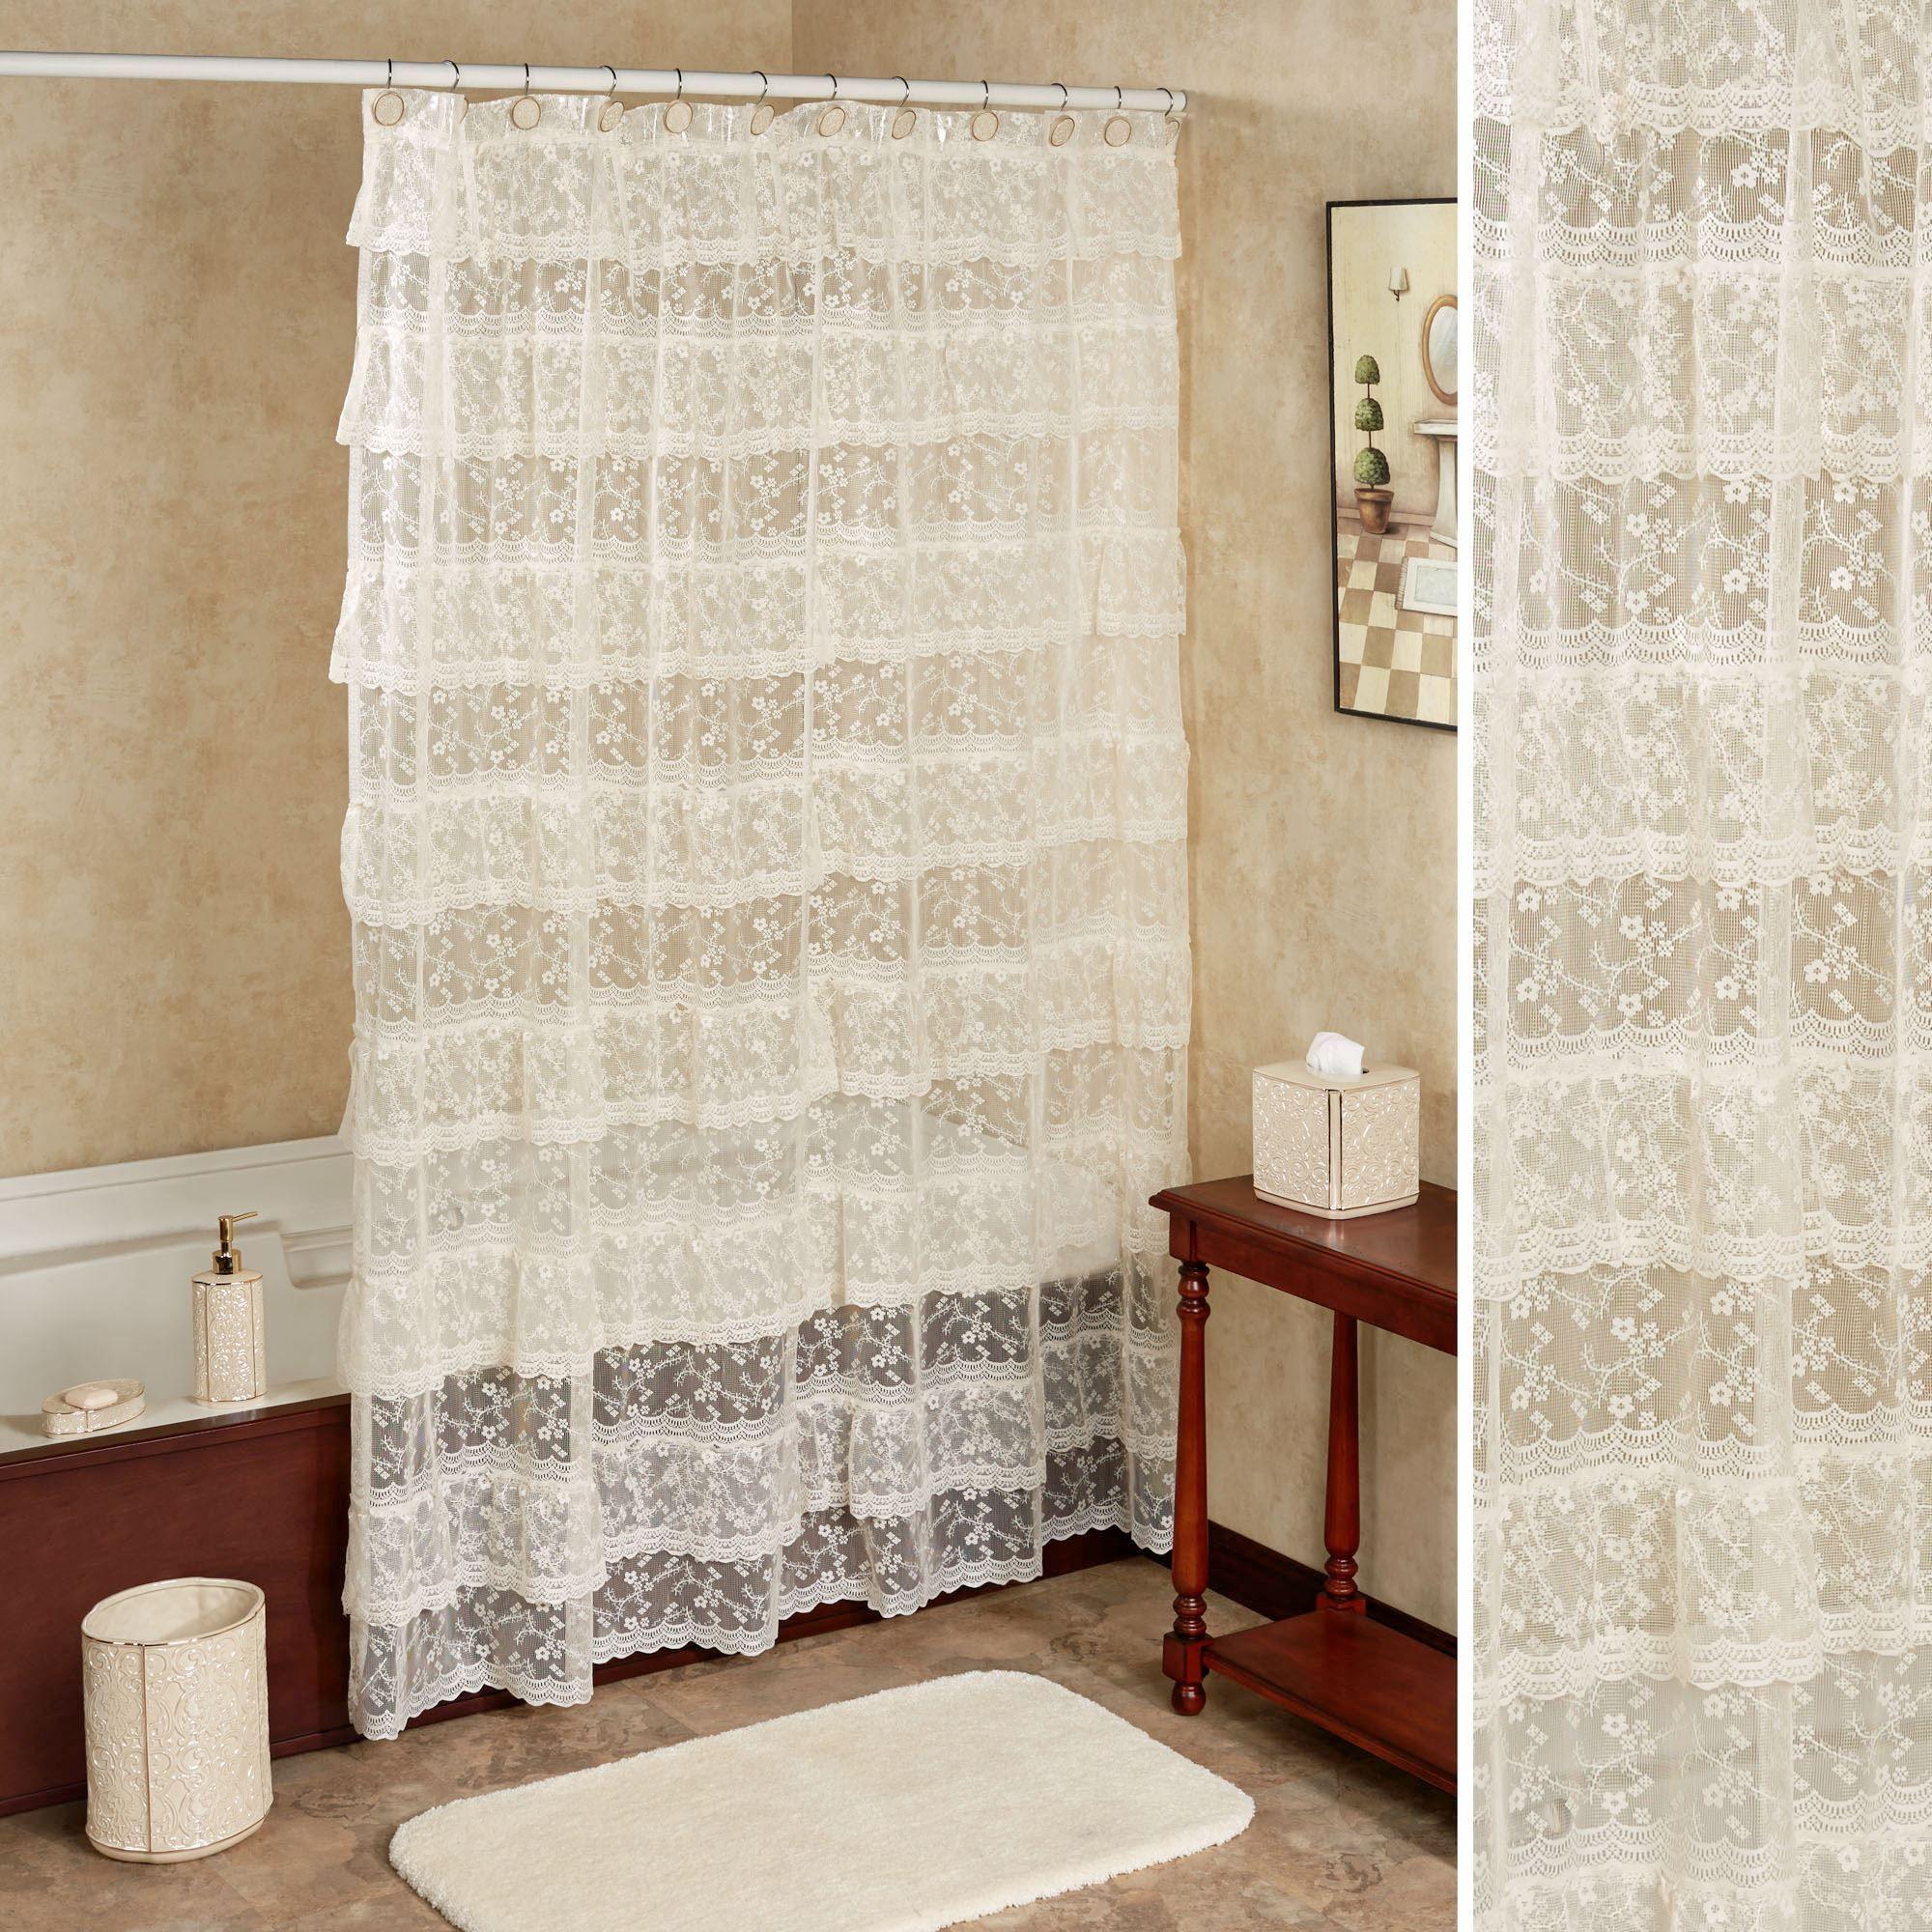 Bridal Lace Shower Curtain 70 x 72